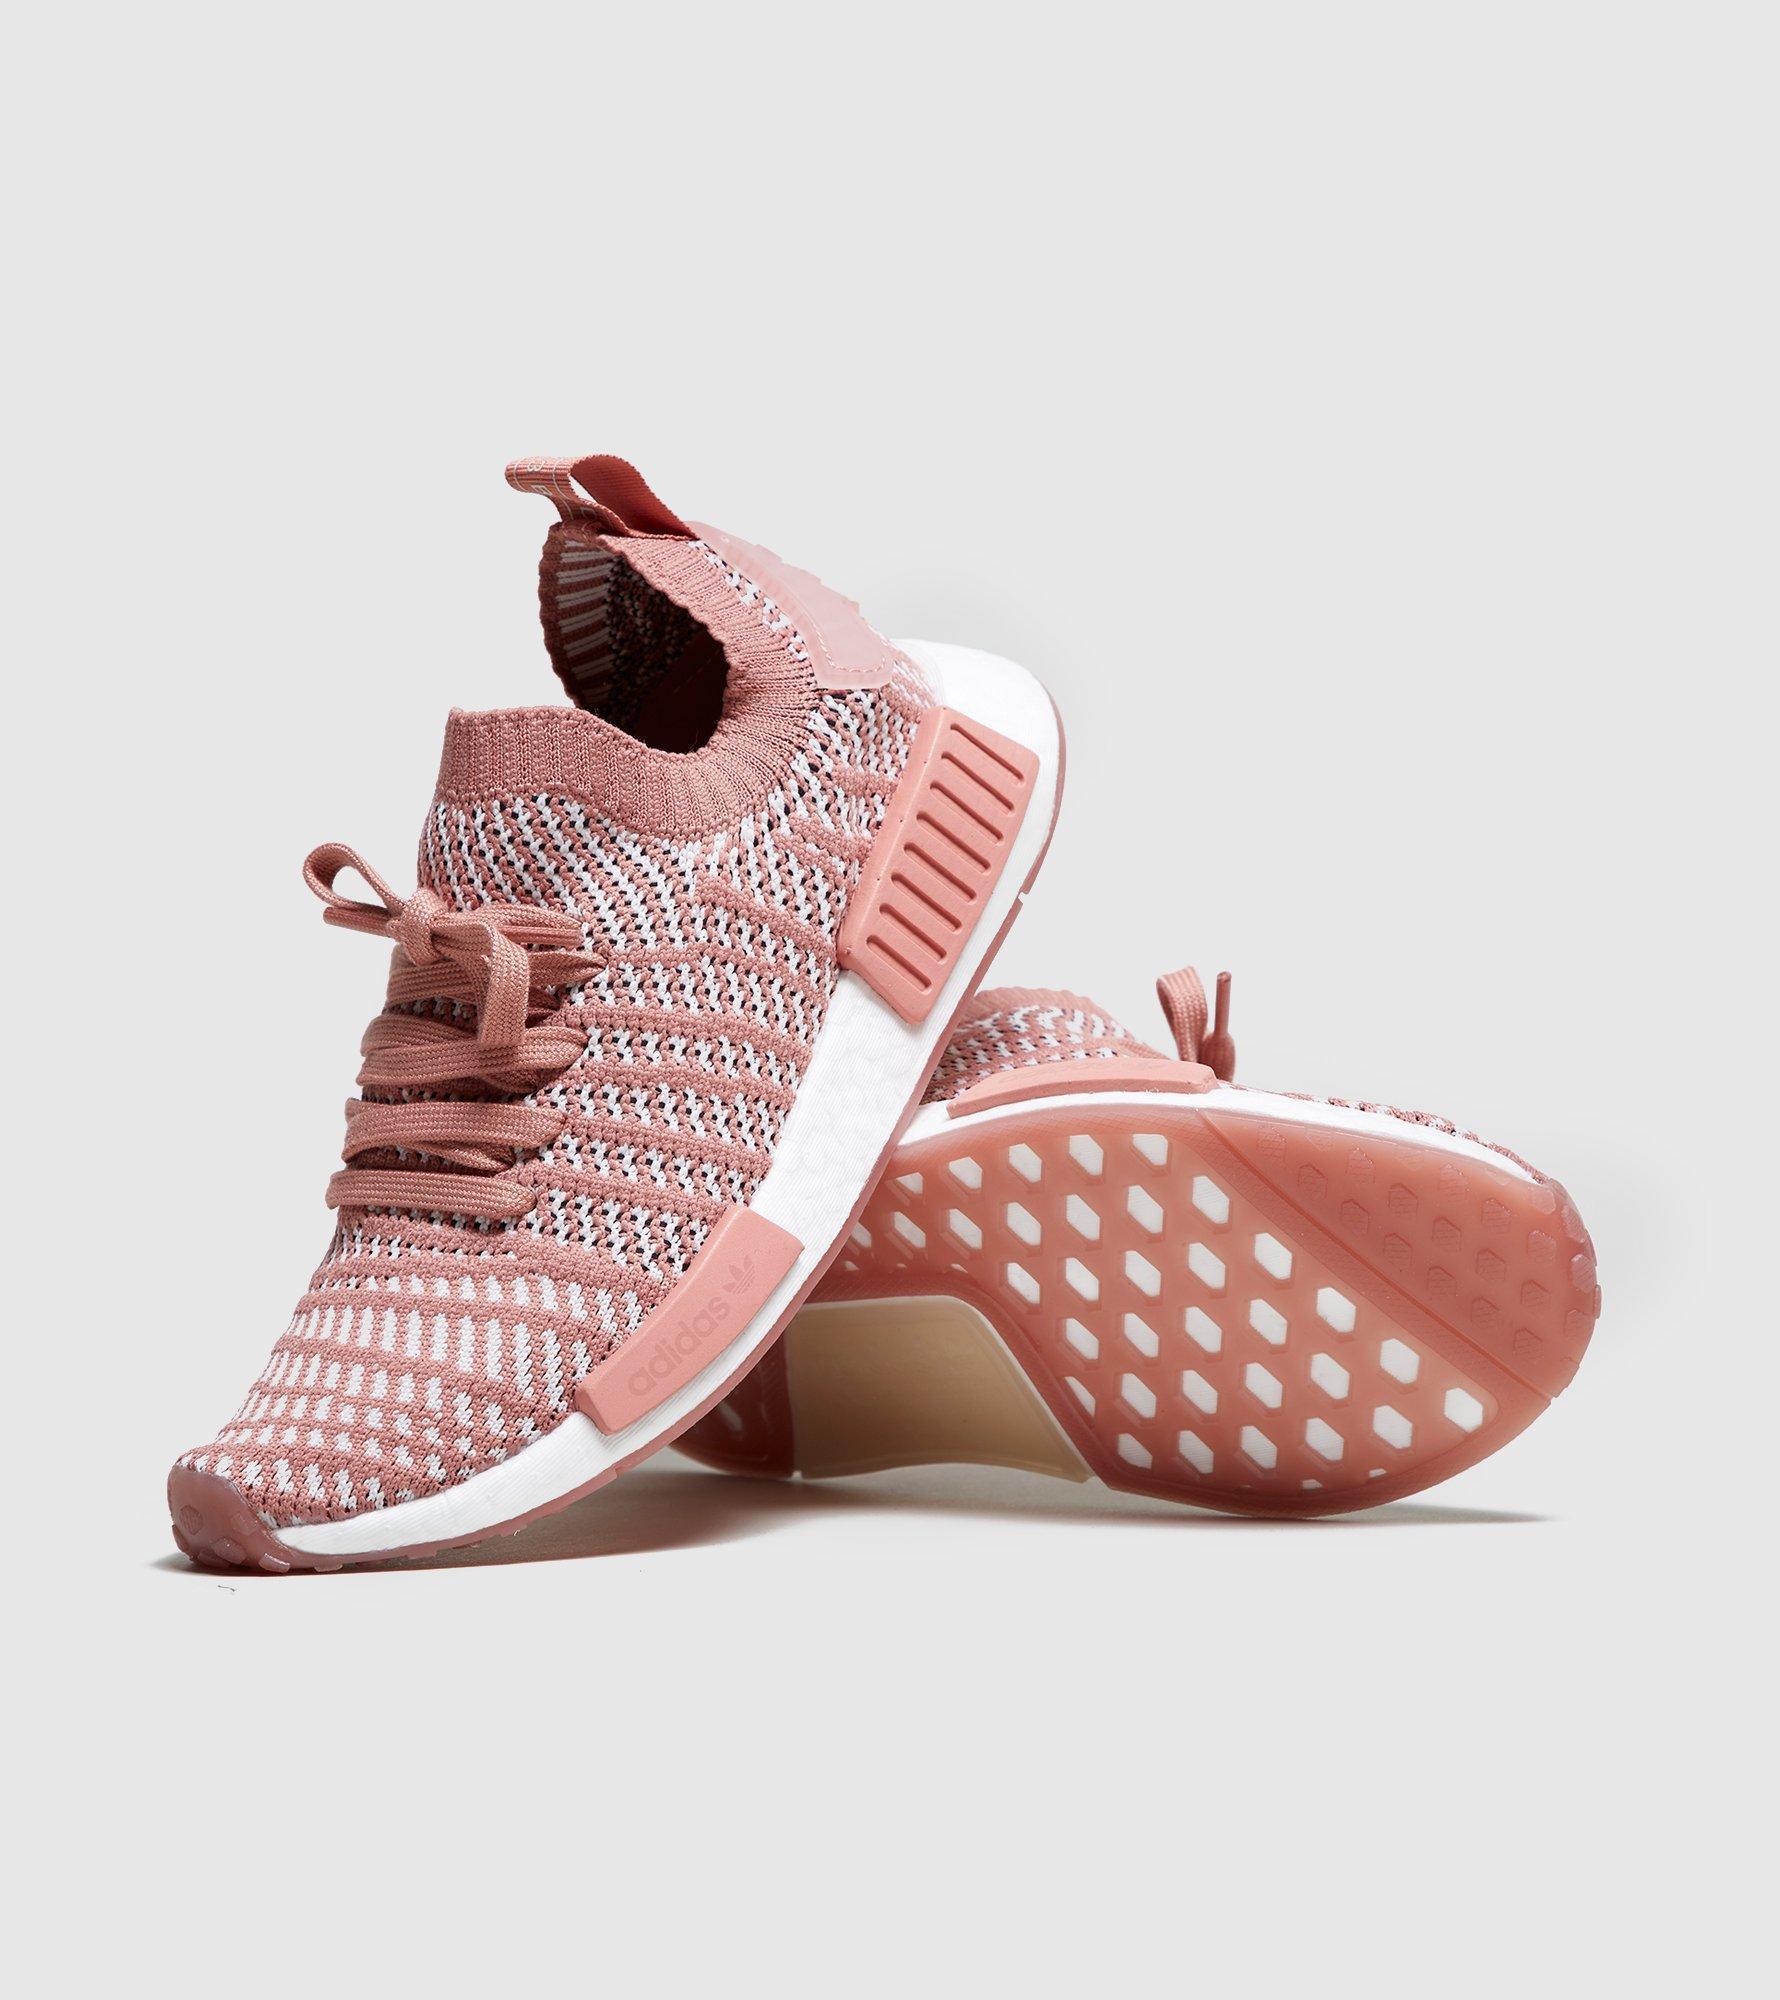 Lyst - adidas Originals Nmd r1 Stlt Primeknit Women s in Pink d48a324a7